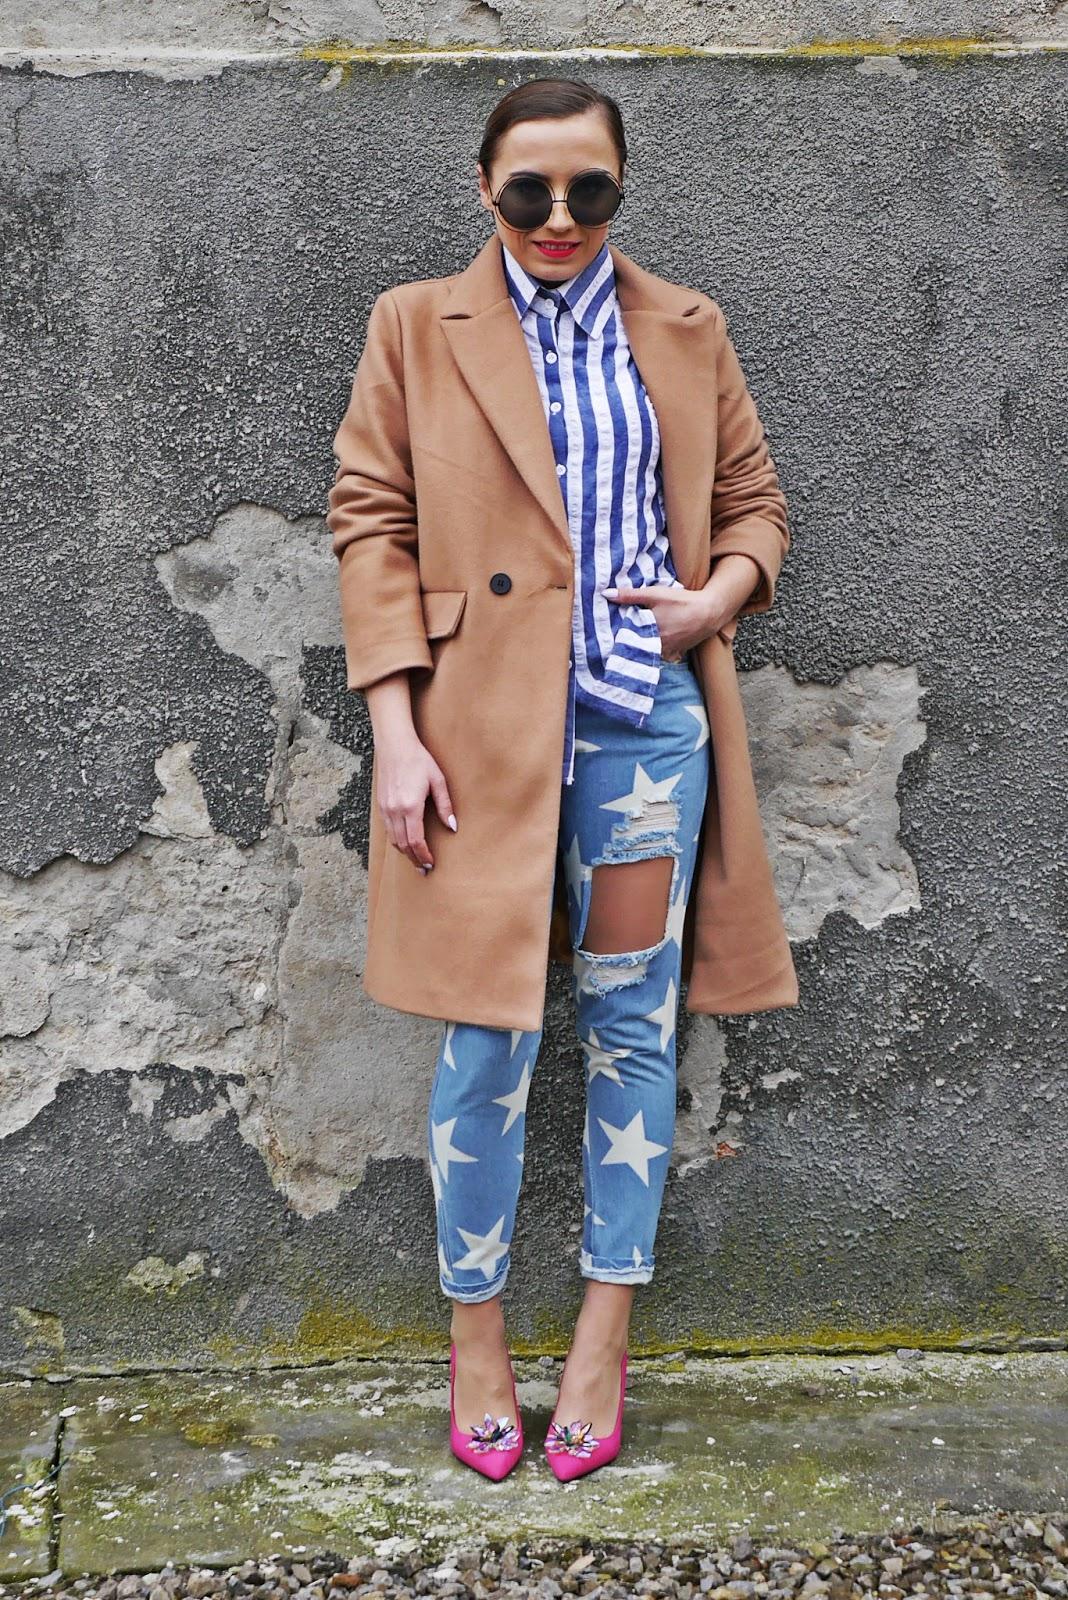 4_pink_heels_renee_baige_coat_stars_jeans_stripes_shirt_karyn_blog_modowy_040218